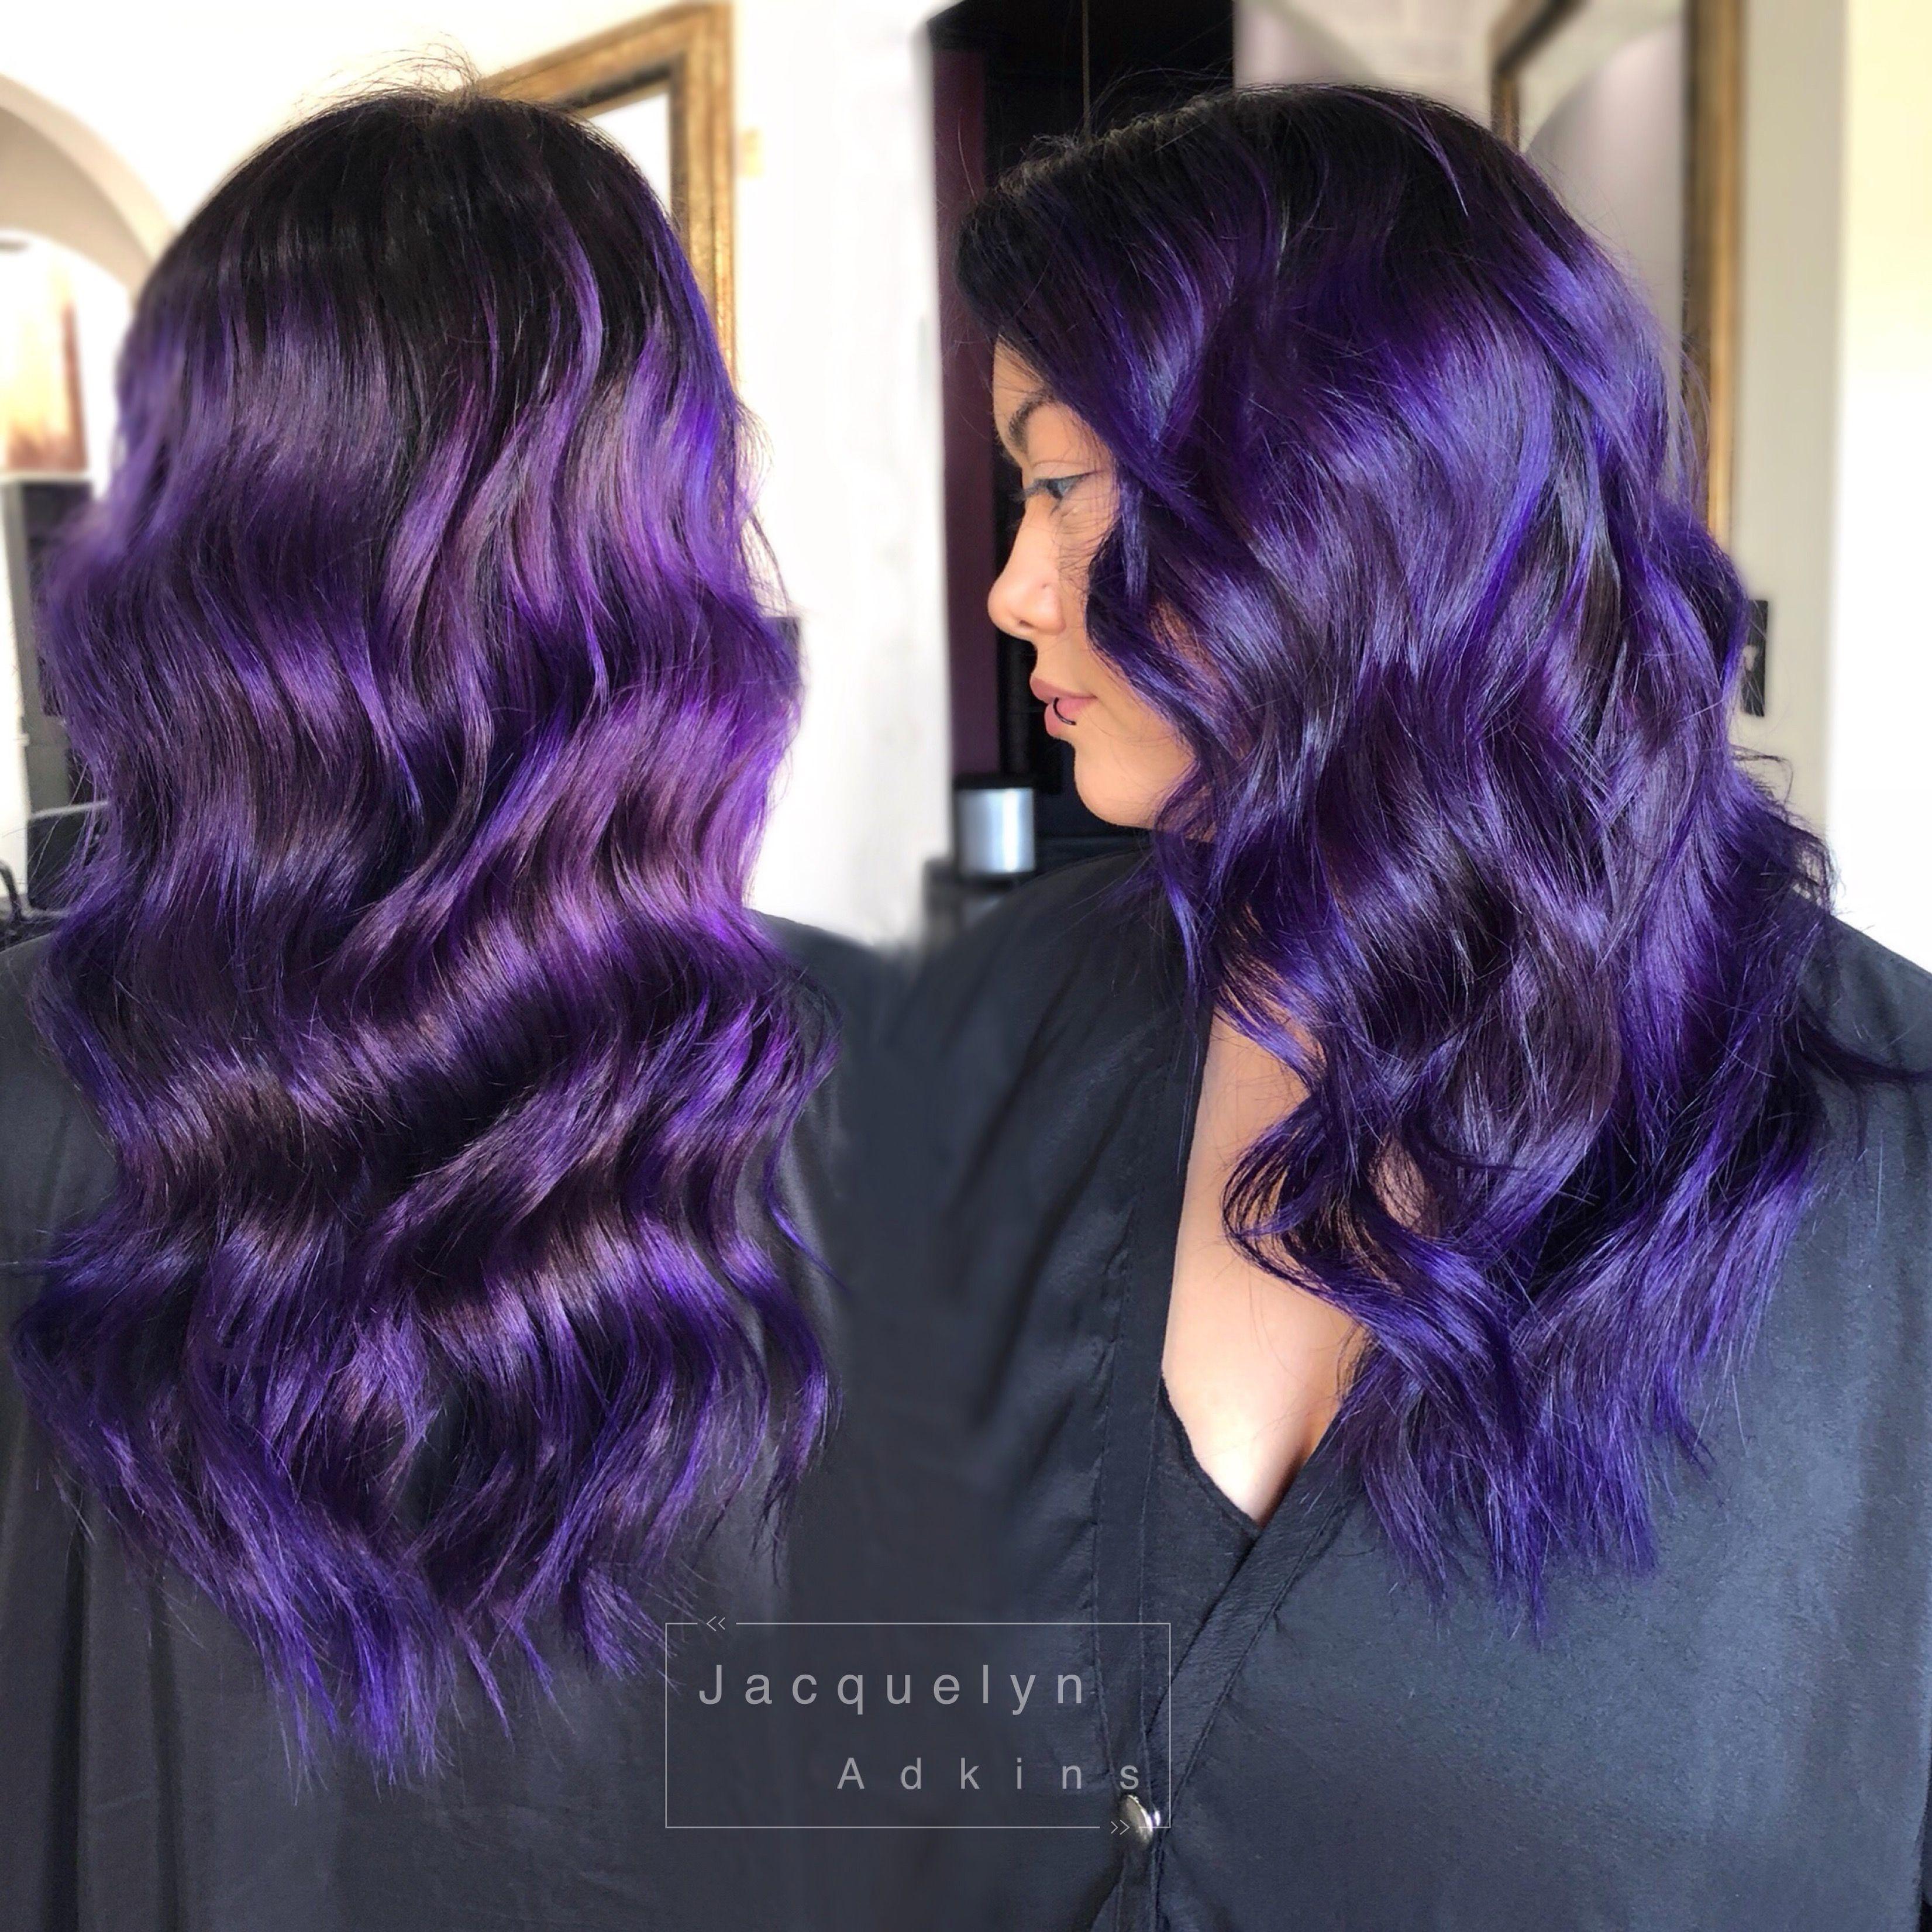 Follow My Instagram Unevneib Dark Hair Violet Hair Violet Balayage Purple Hair Deep Purple Hair Prav Pravana Hair Color Curls For Long Hair Deep Purple Hair